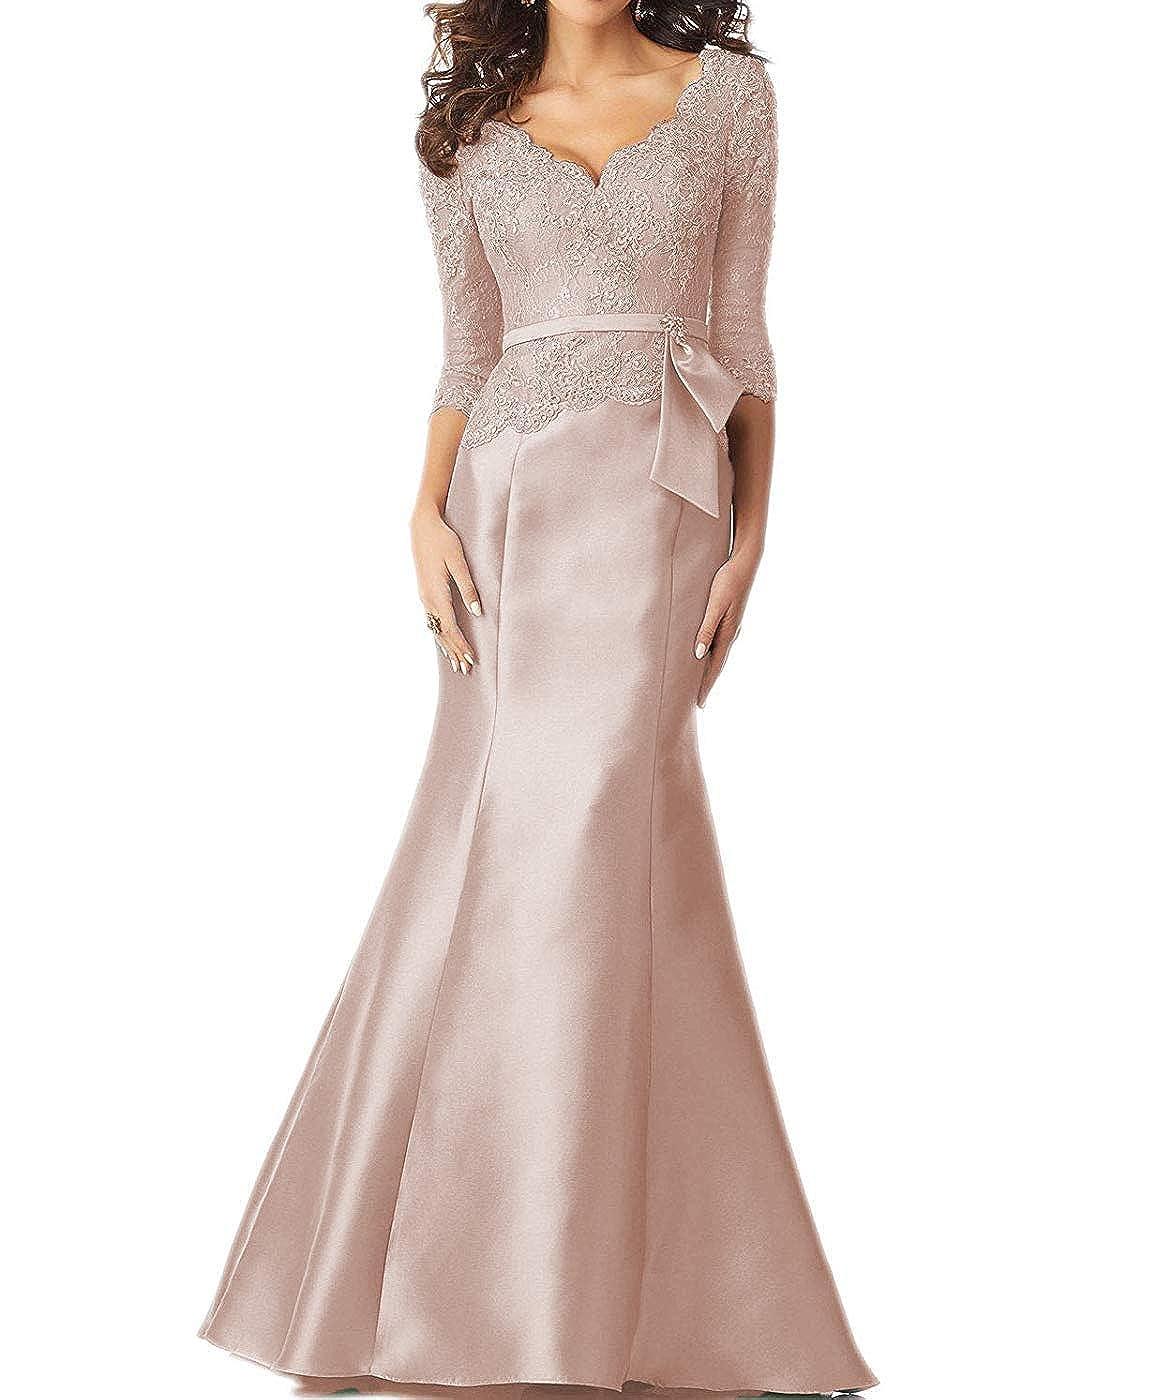 bluesh tutu.vivi Women's VNeck Lace Mermaid Evening Prom Dresses 3 4 Sleeves Appliques Long Formal Gown